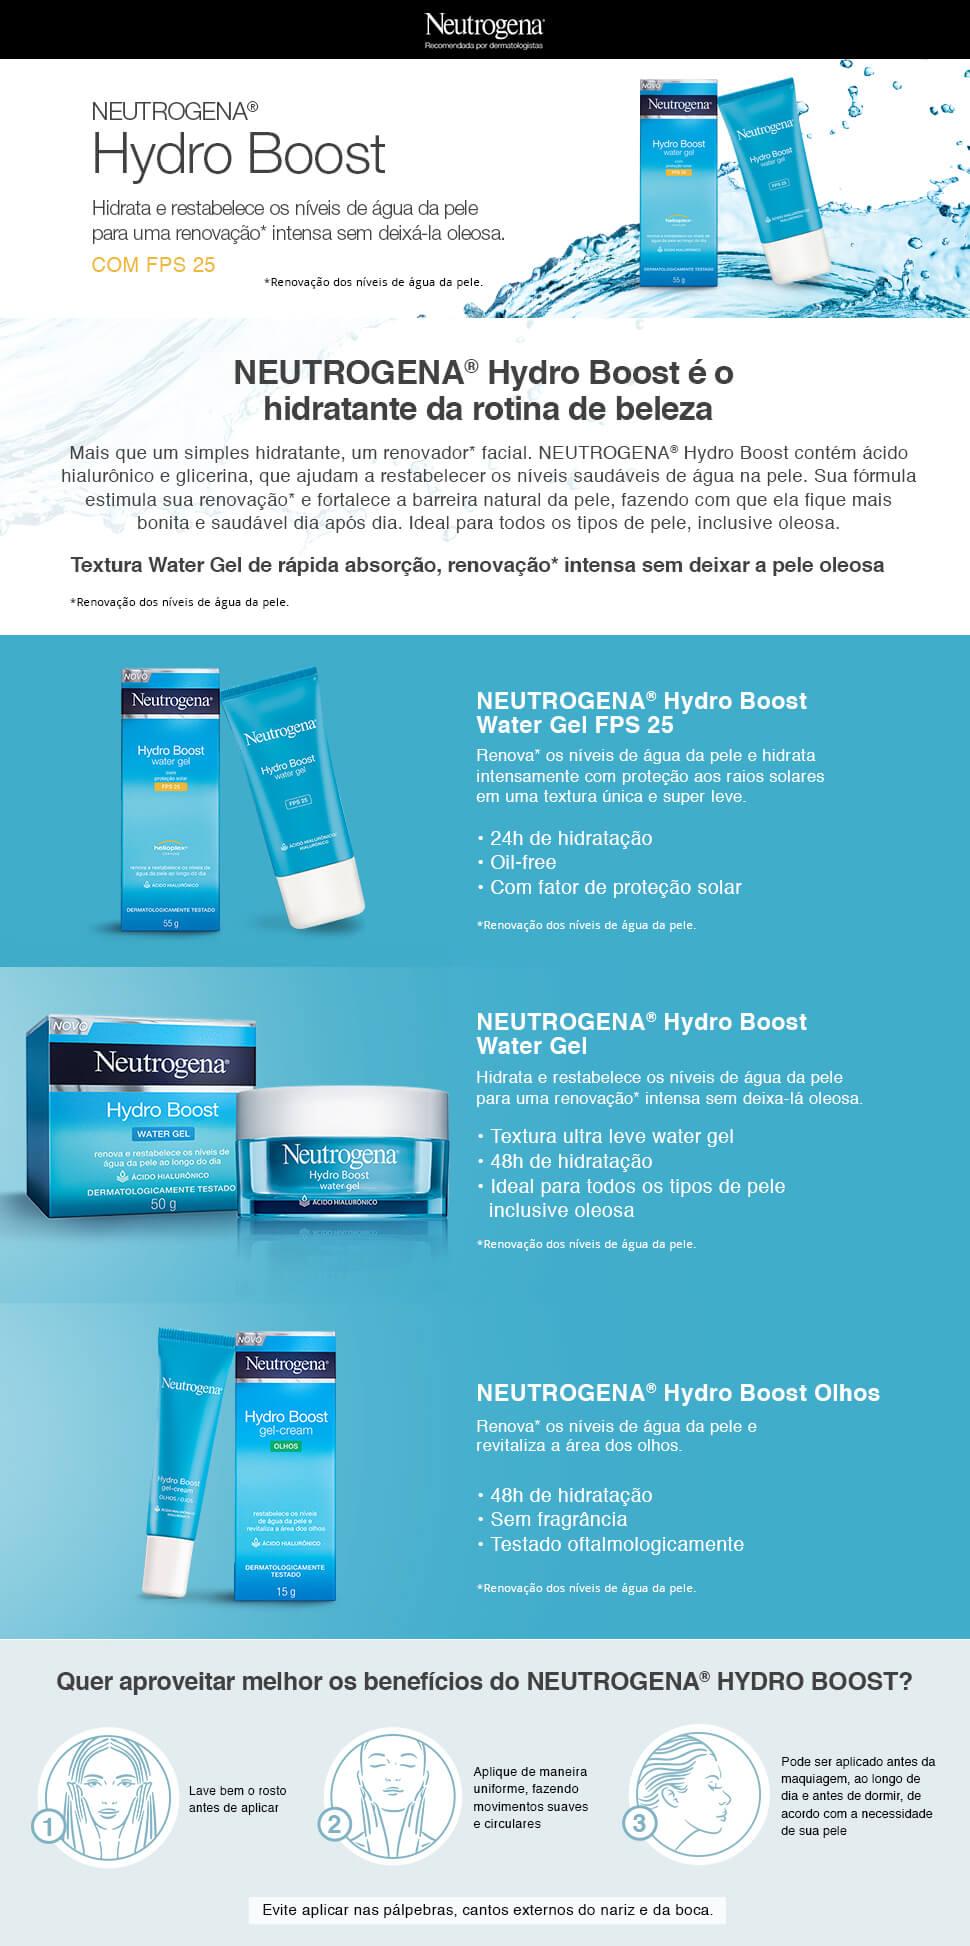 Lamina Neutrogena Hydro Boost Water Gel